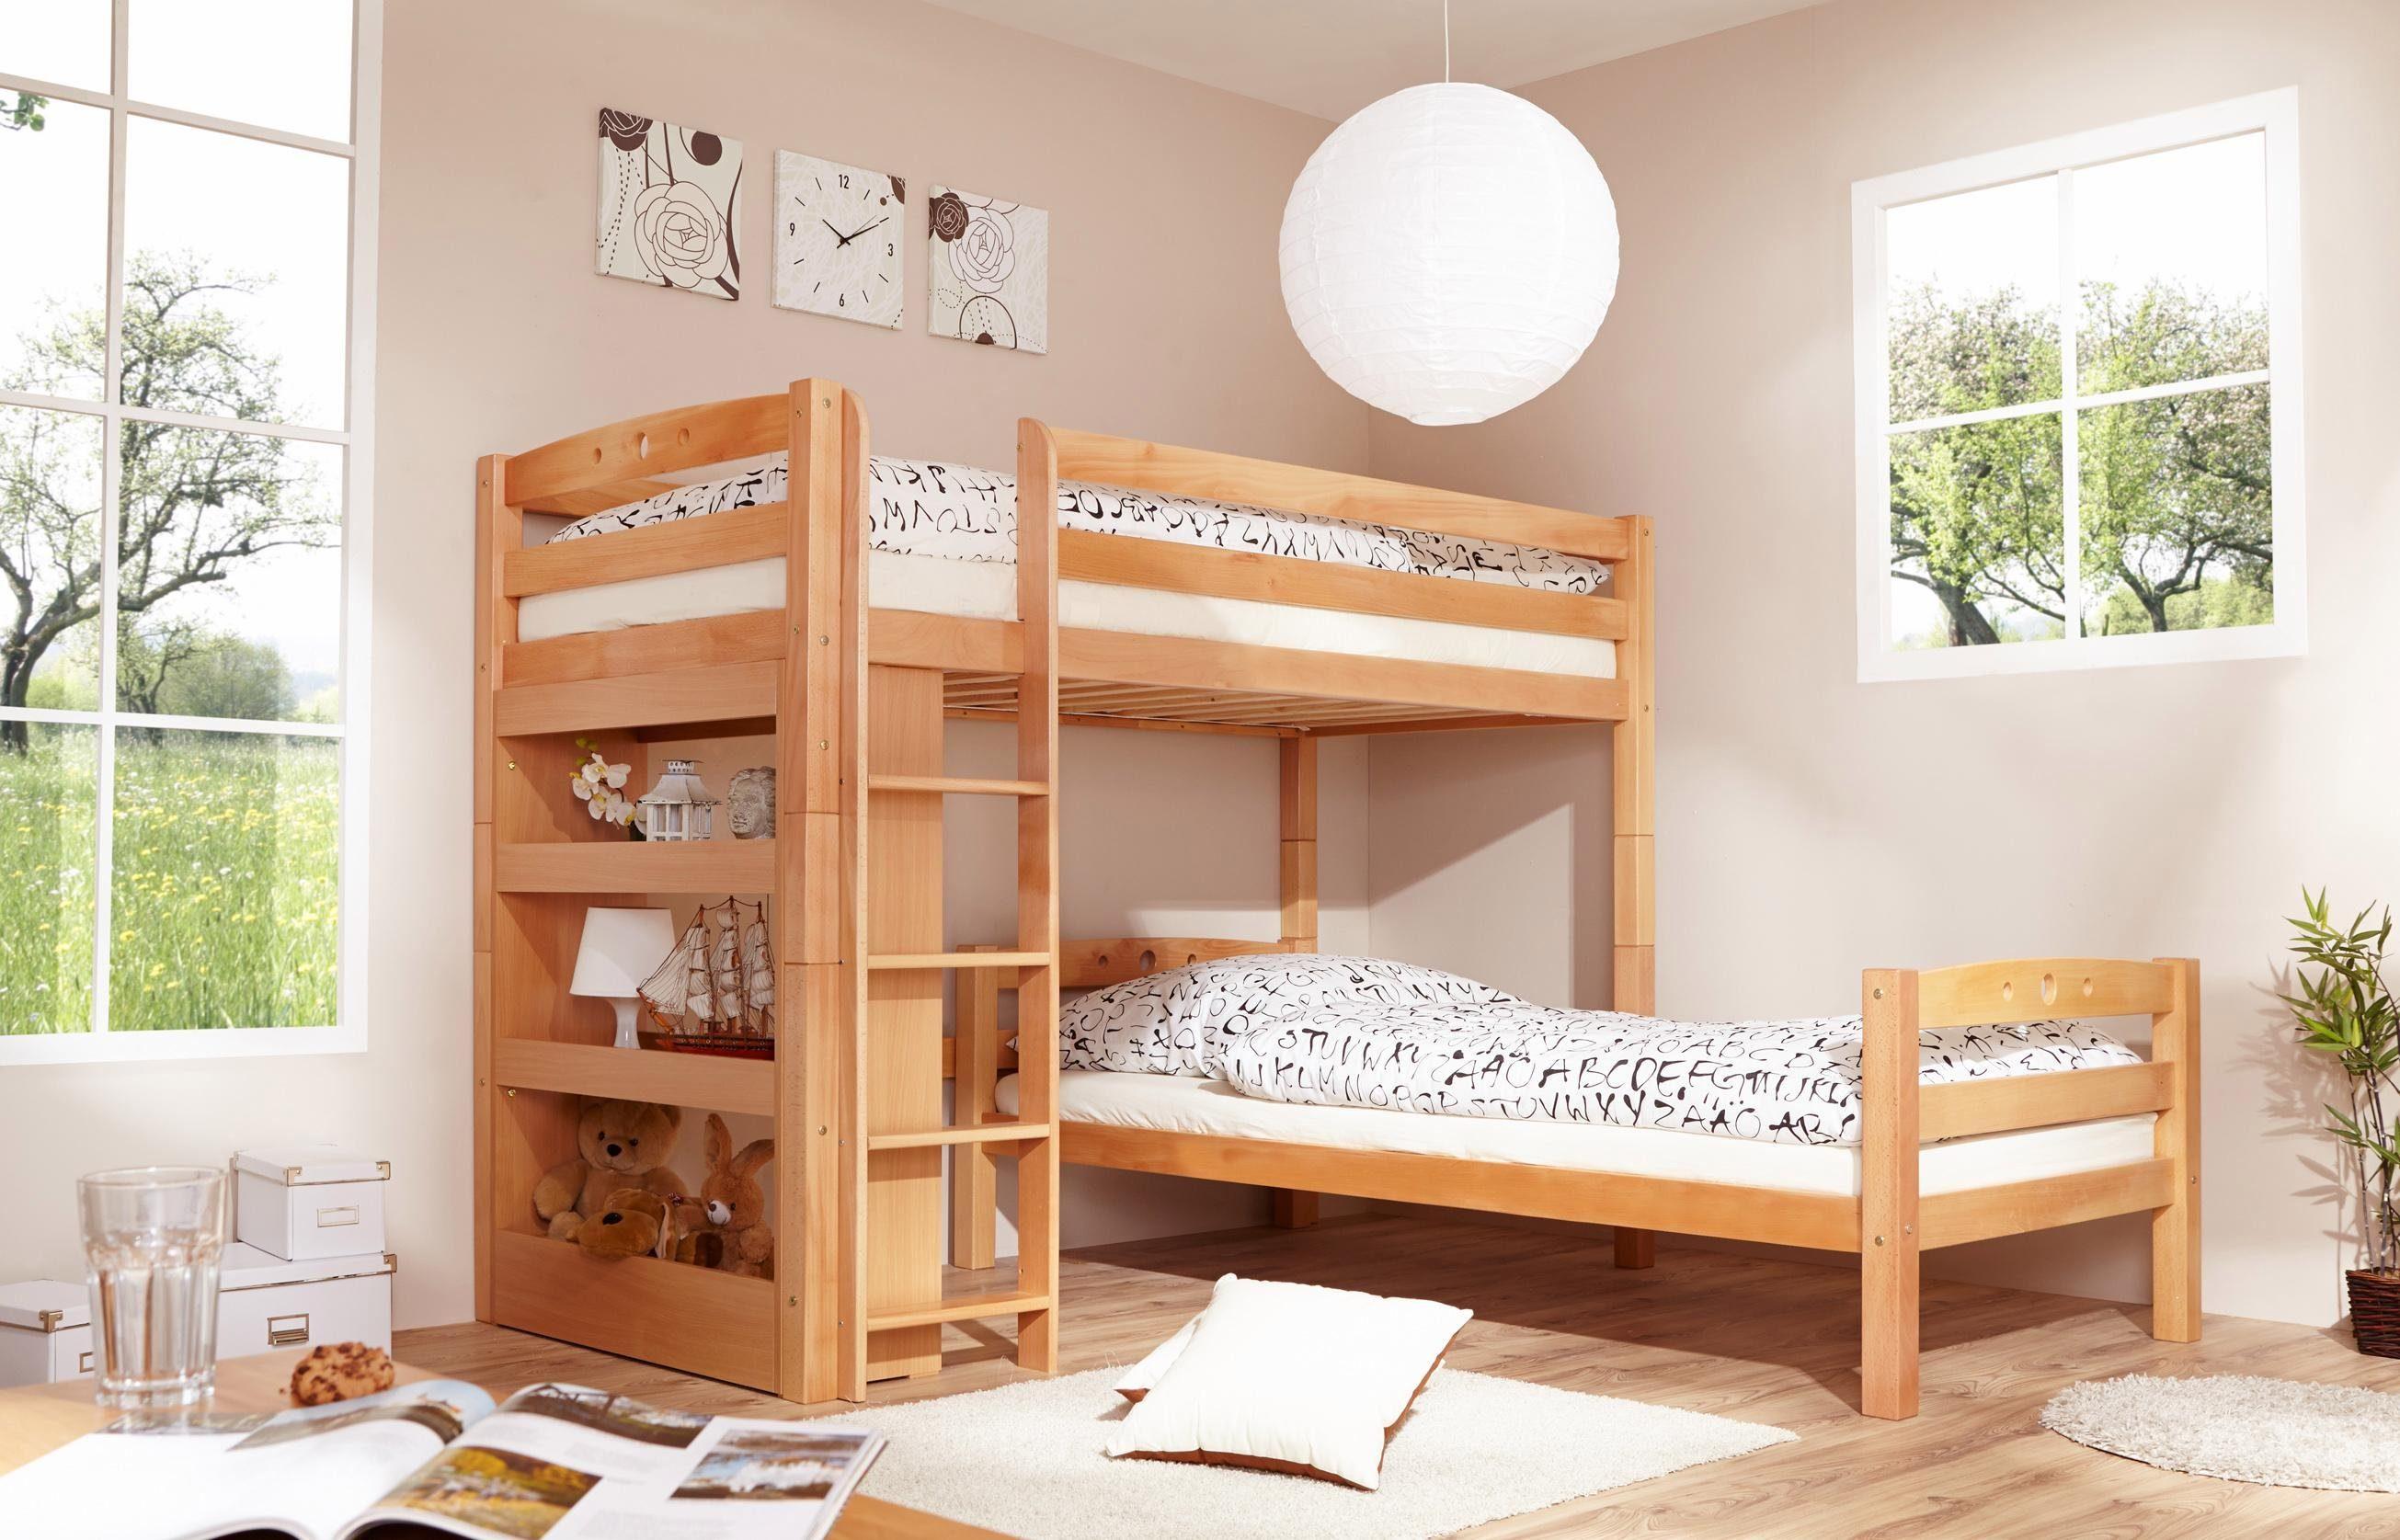 Etagenbett Groß : Etagenbett doppelstockbett online kaufen stockbett otto